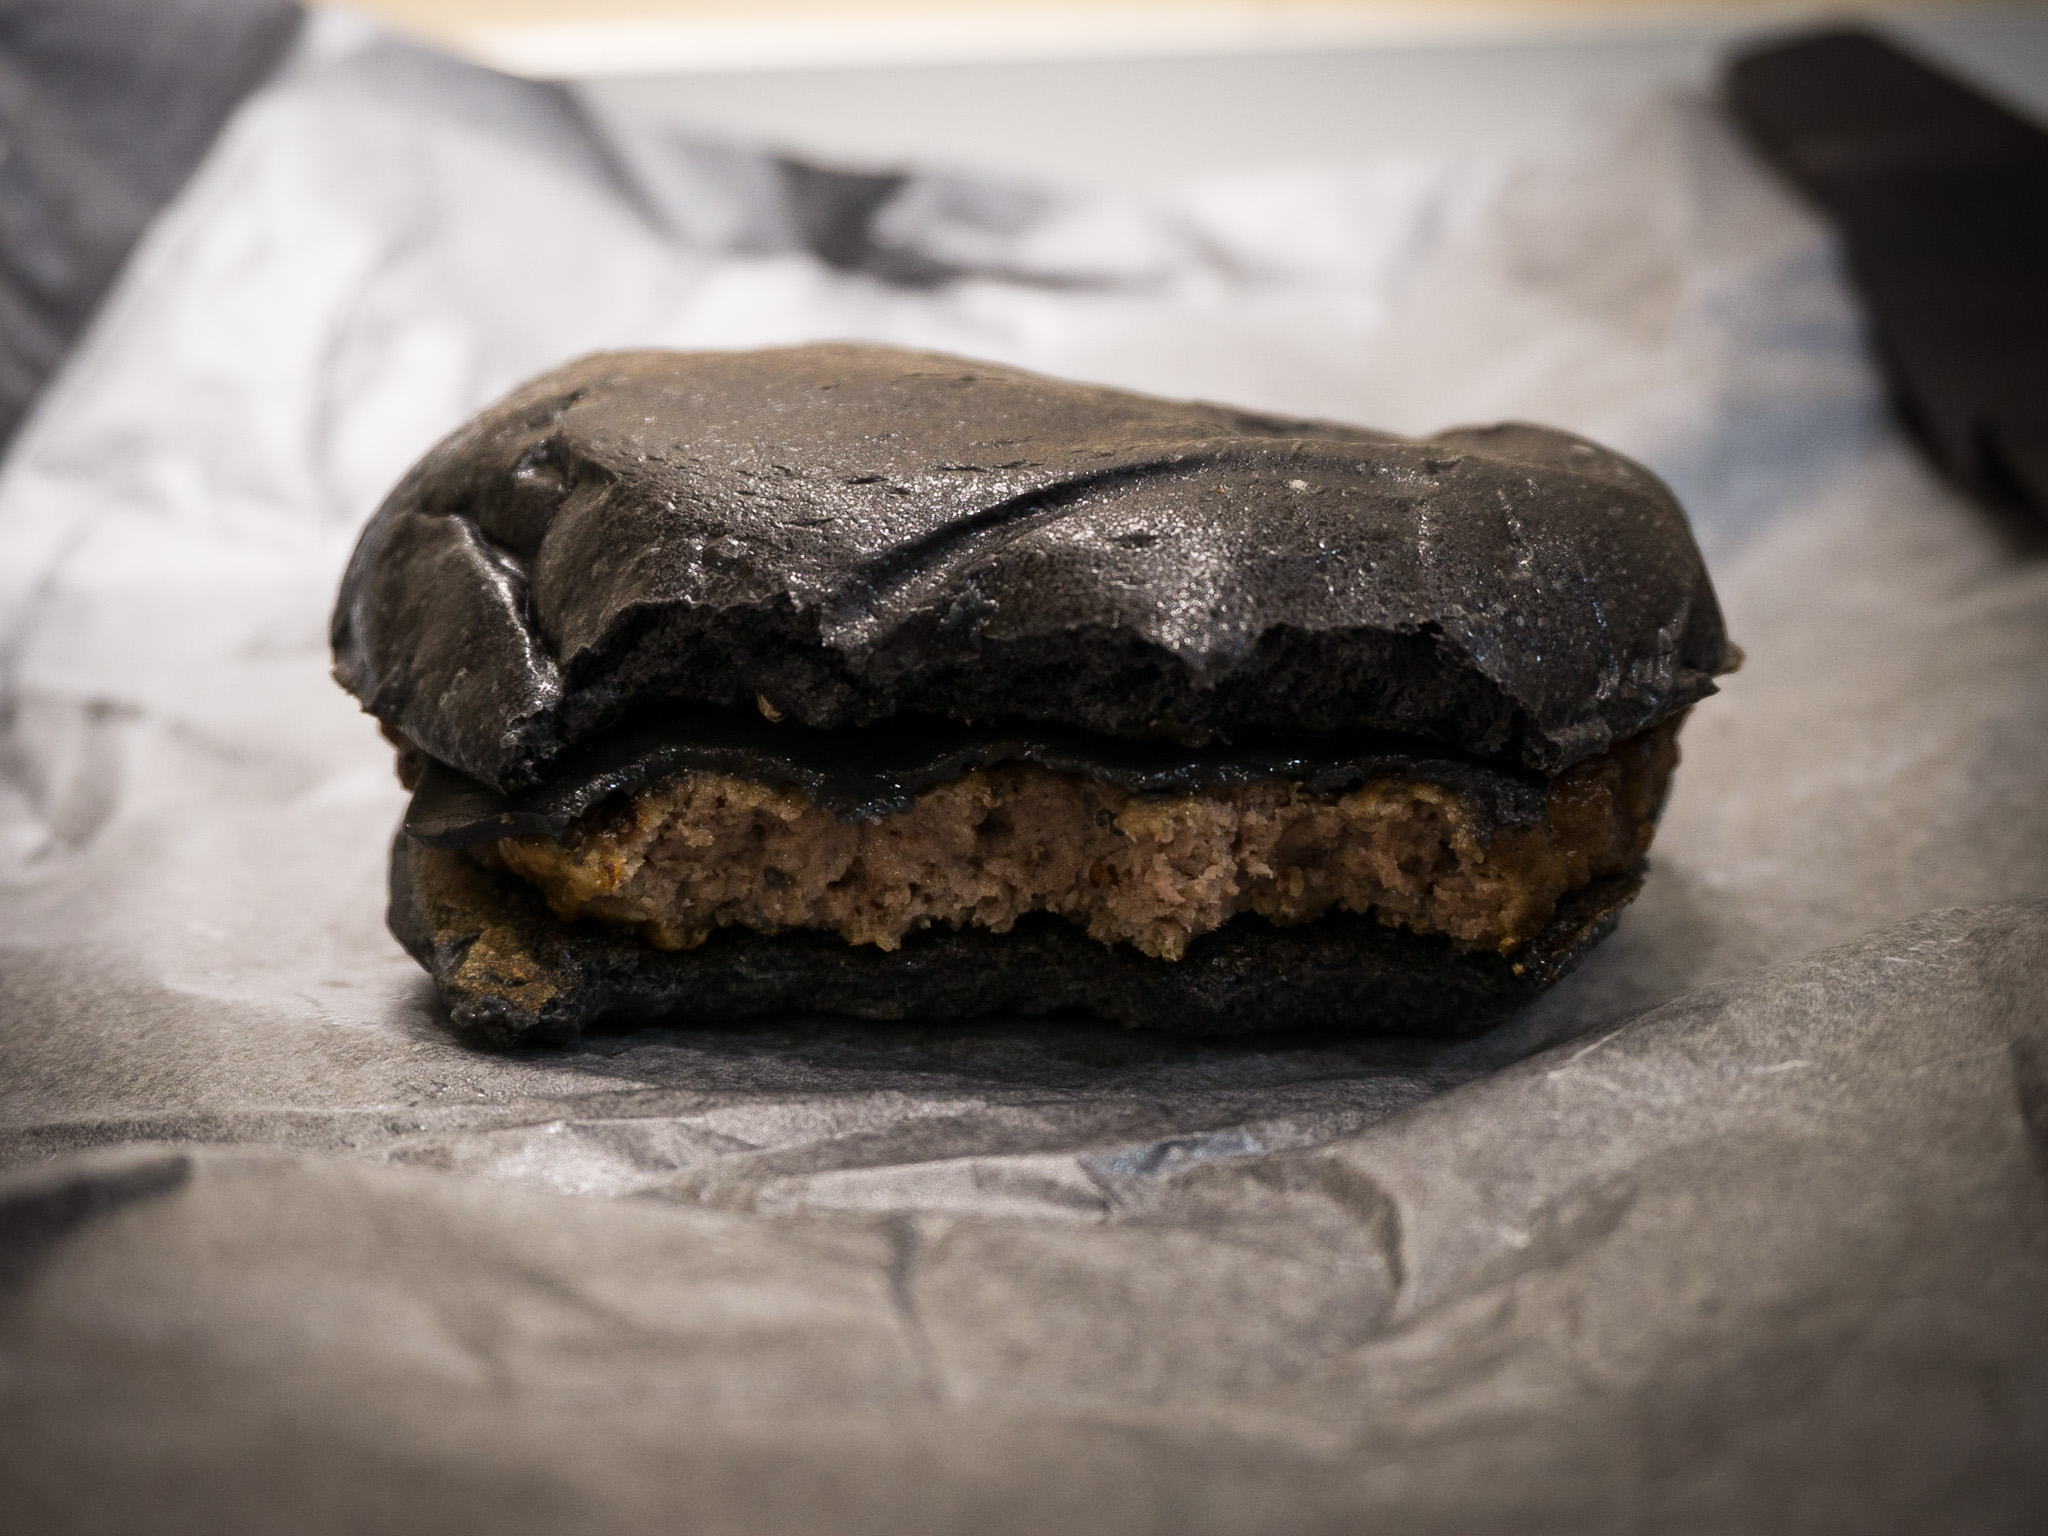 Burger King's scary Black Burger